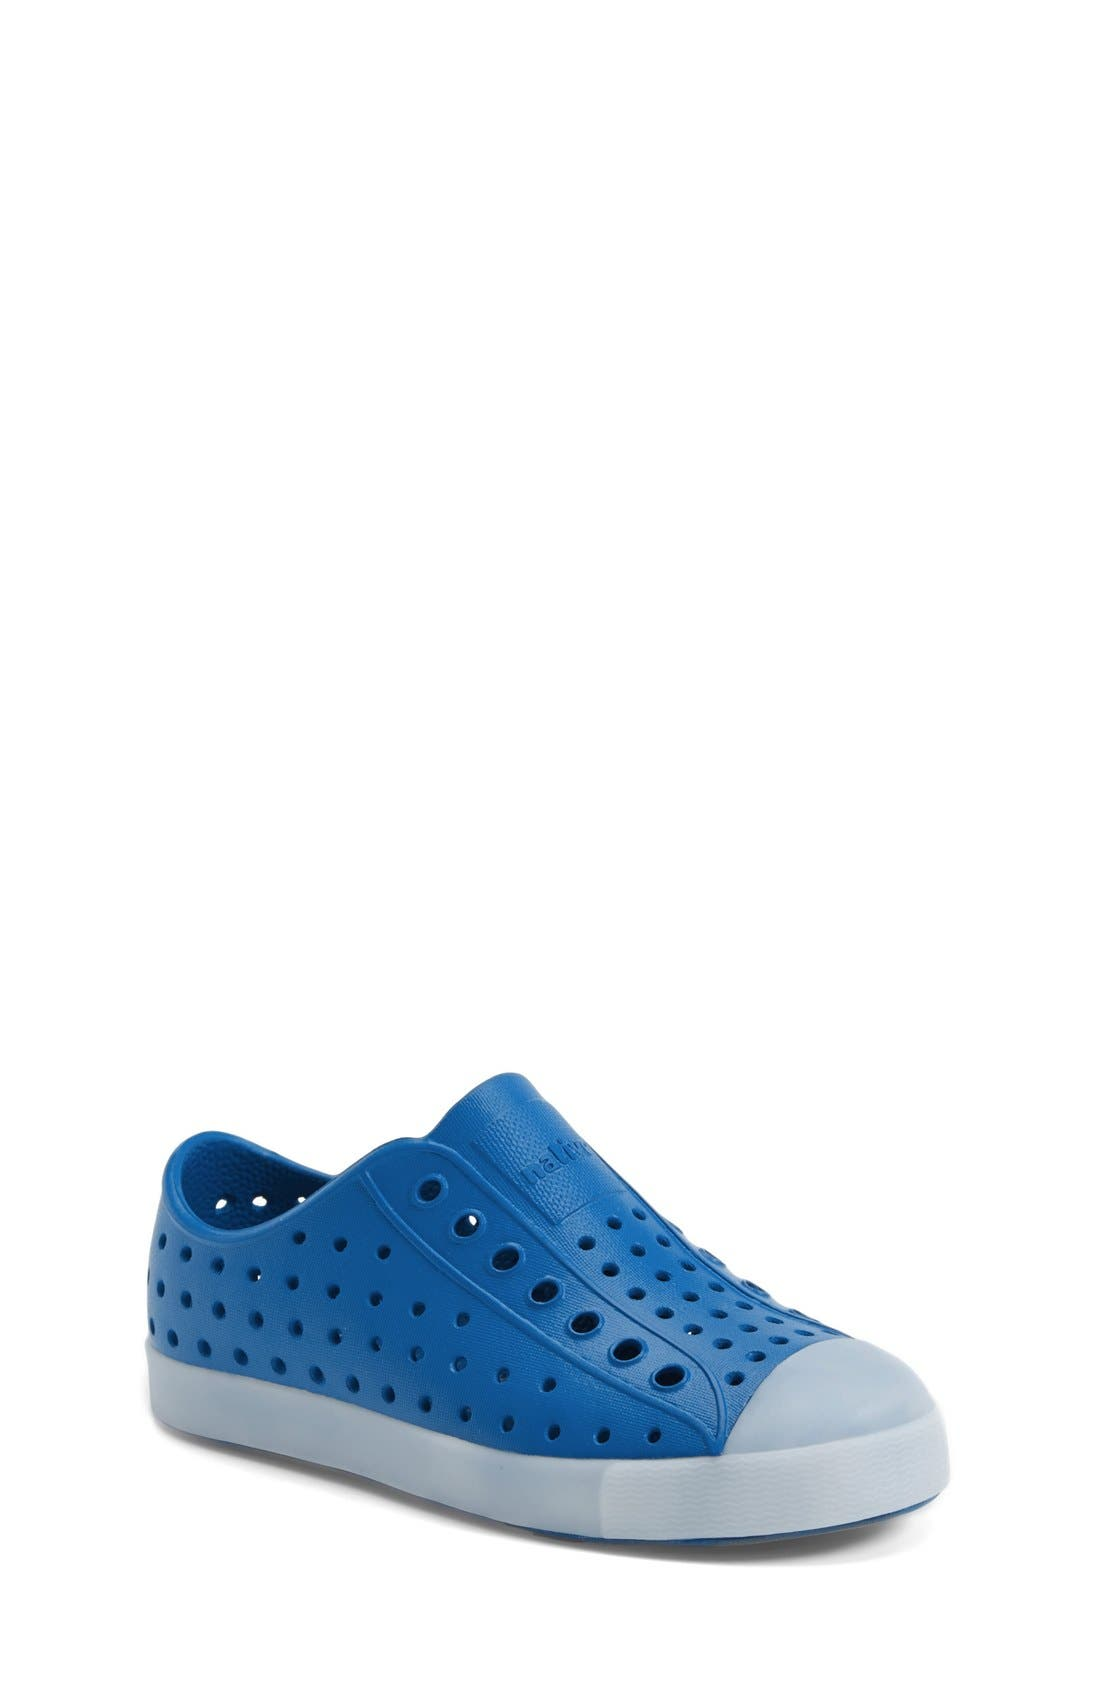 Alternate Image 1 Selected - Native Shoes Jefferson - Glow in the Dark Sneaker (Walker, Toddler & Little Kid)